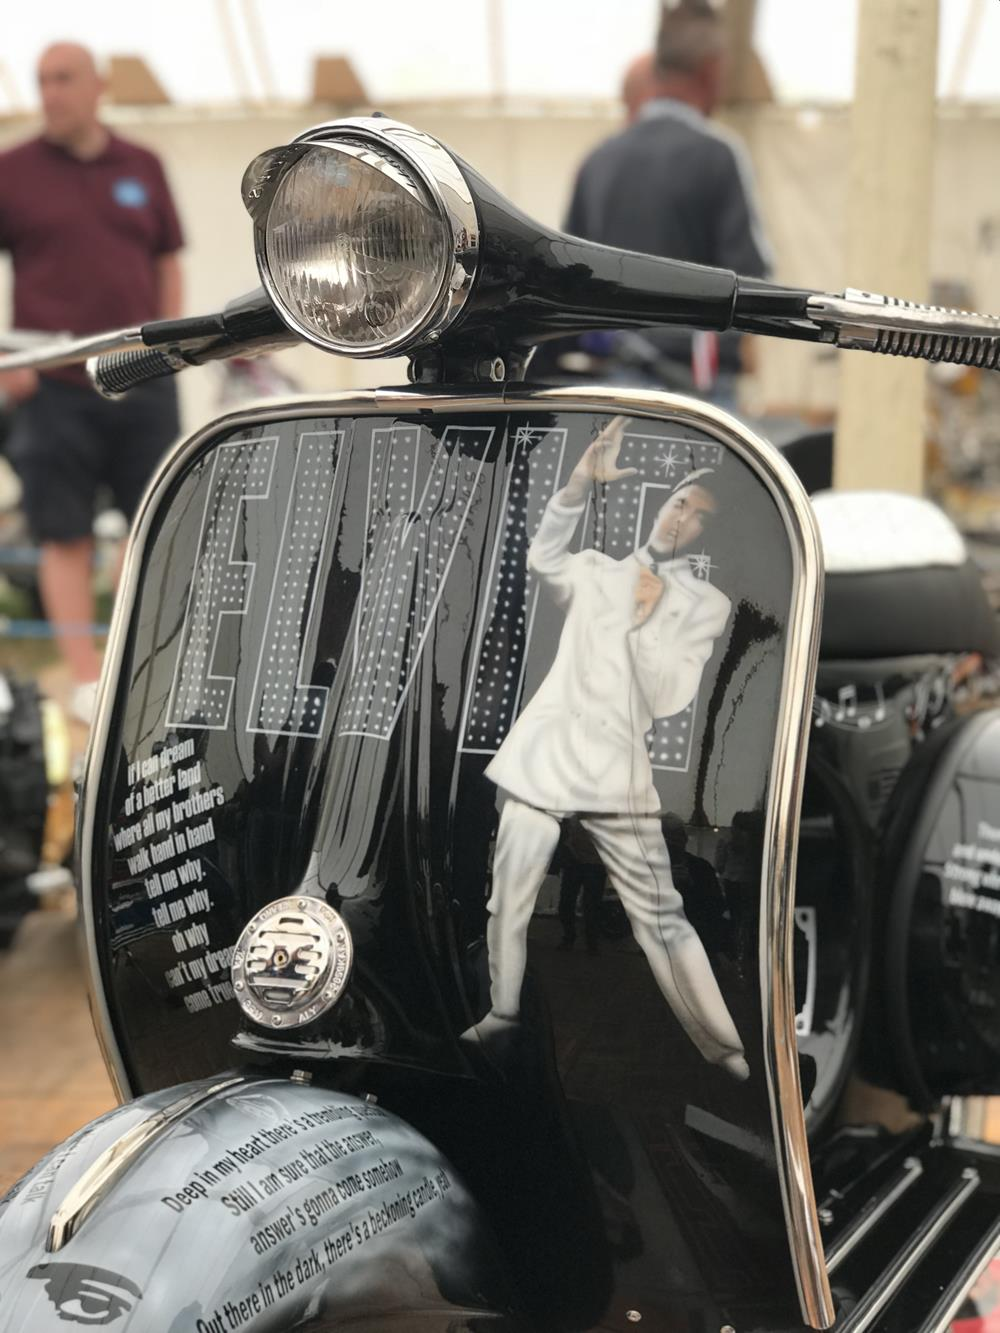 Vespa front legshields with Elvis Presley murals